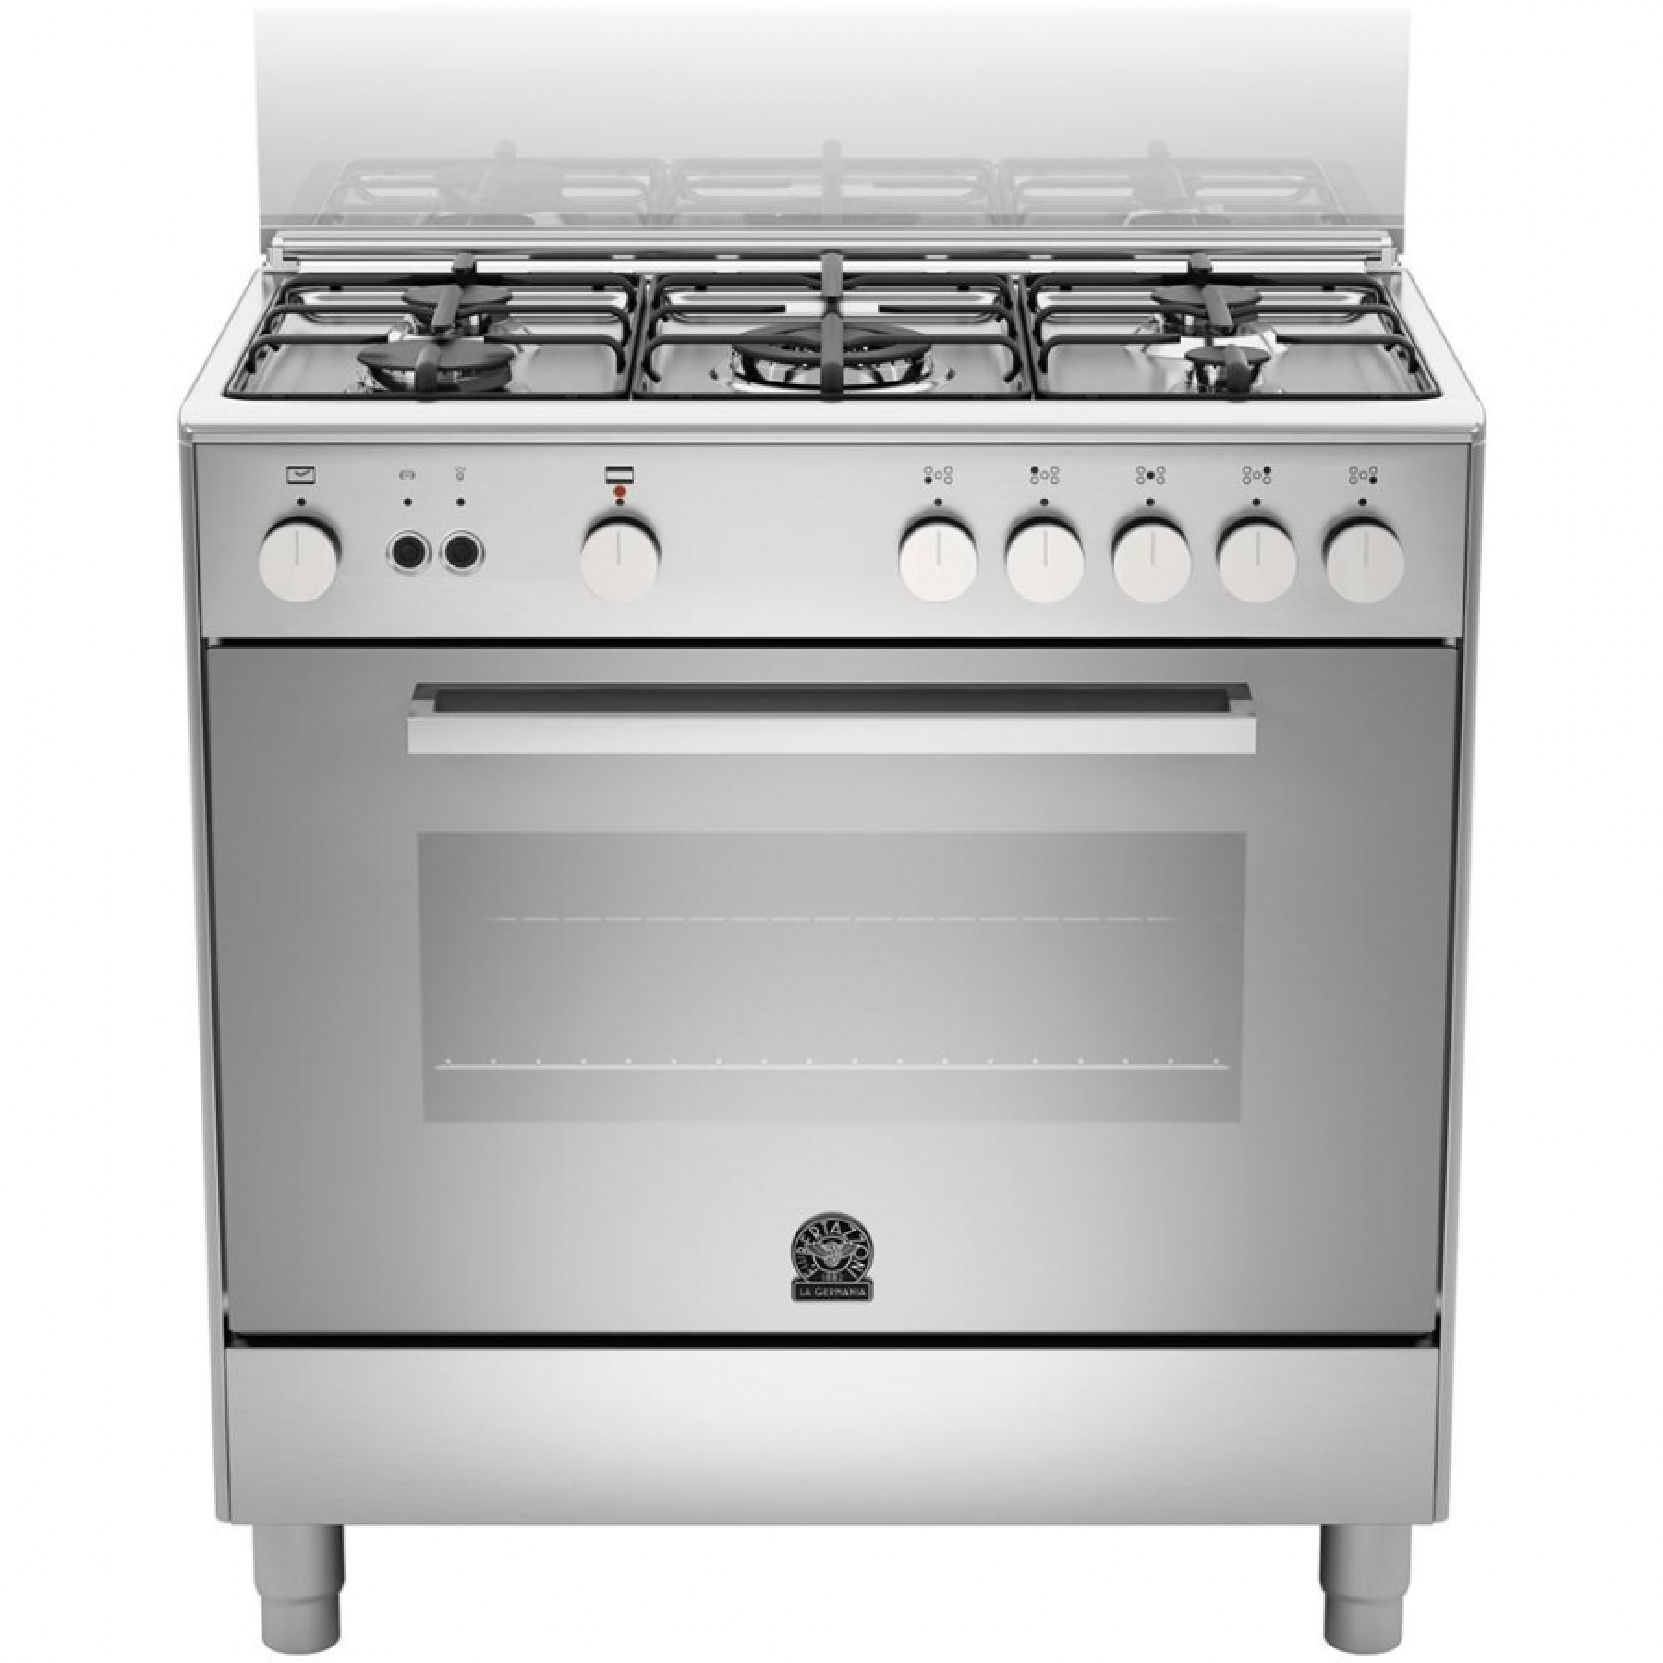 Cucina la germania tu85c61dxt 80x50 5 fuochi a gas forno elettrico colore inox elettrovillage - Cucina elettrica de longhi ...